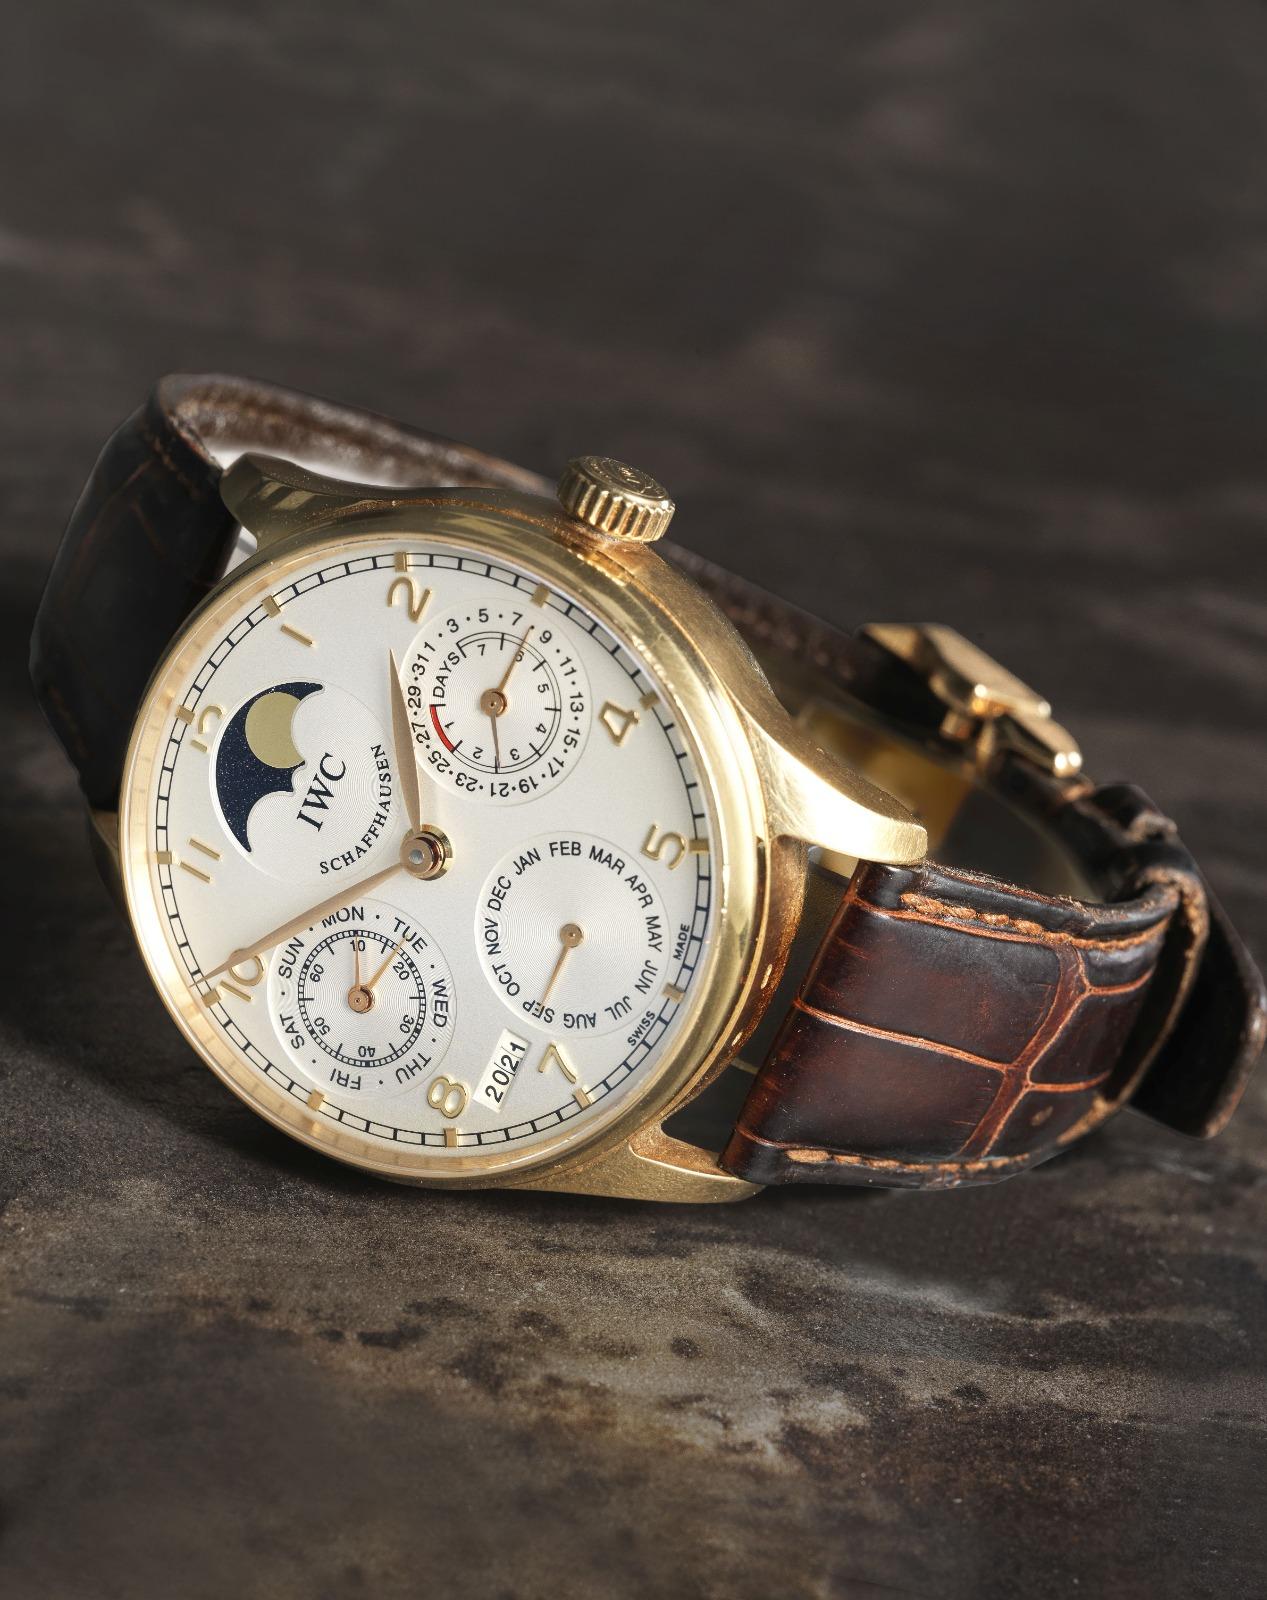 Watches and Wristwatches Auction by Bonhams - MondaniWeb